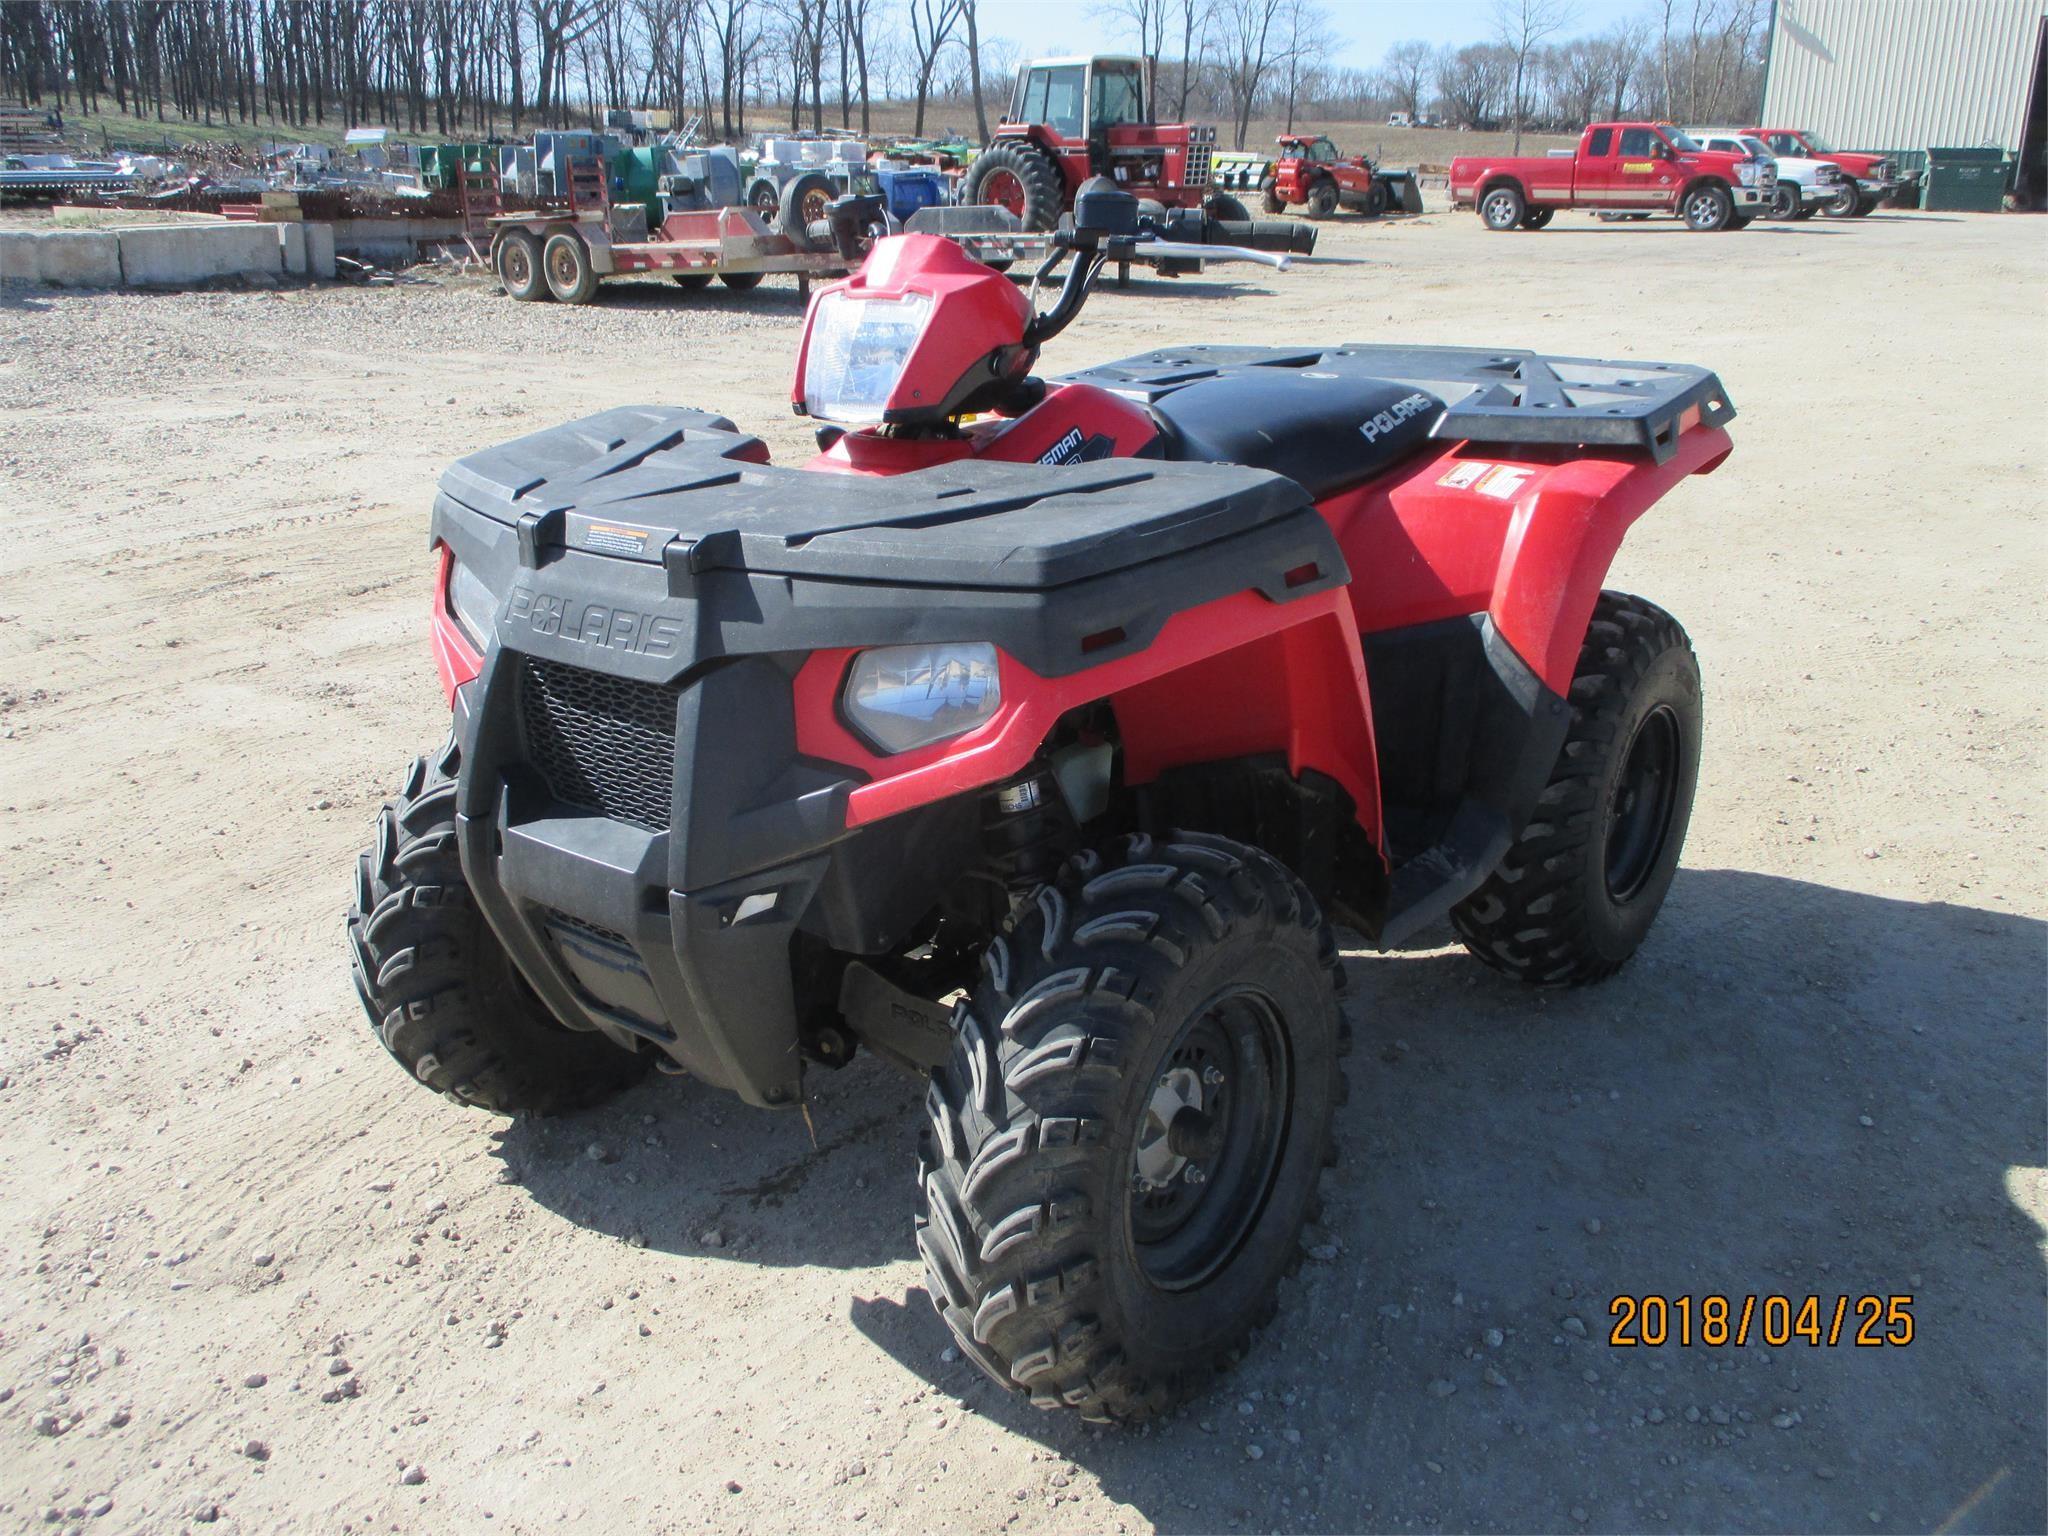 2011 POLARIS SPORTSMAN 500 HO For Sale in Worthington, Iowa